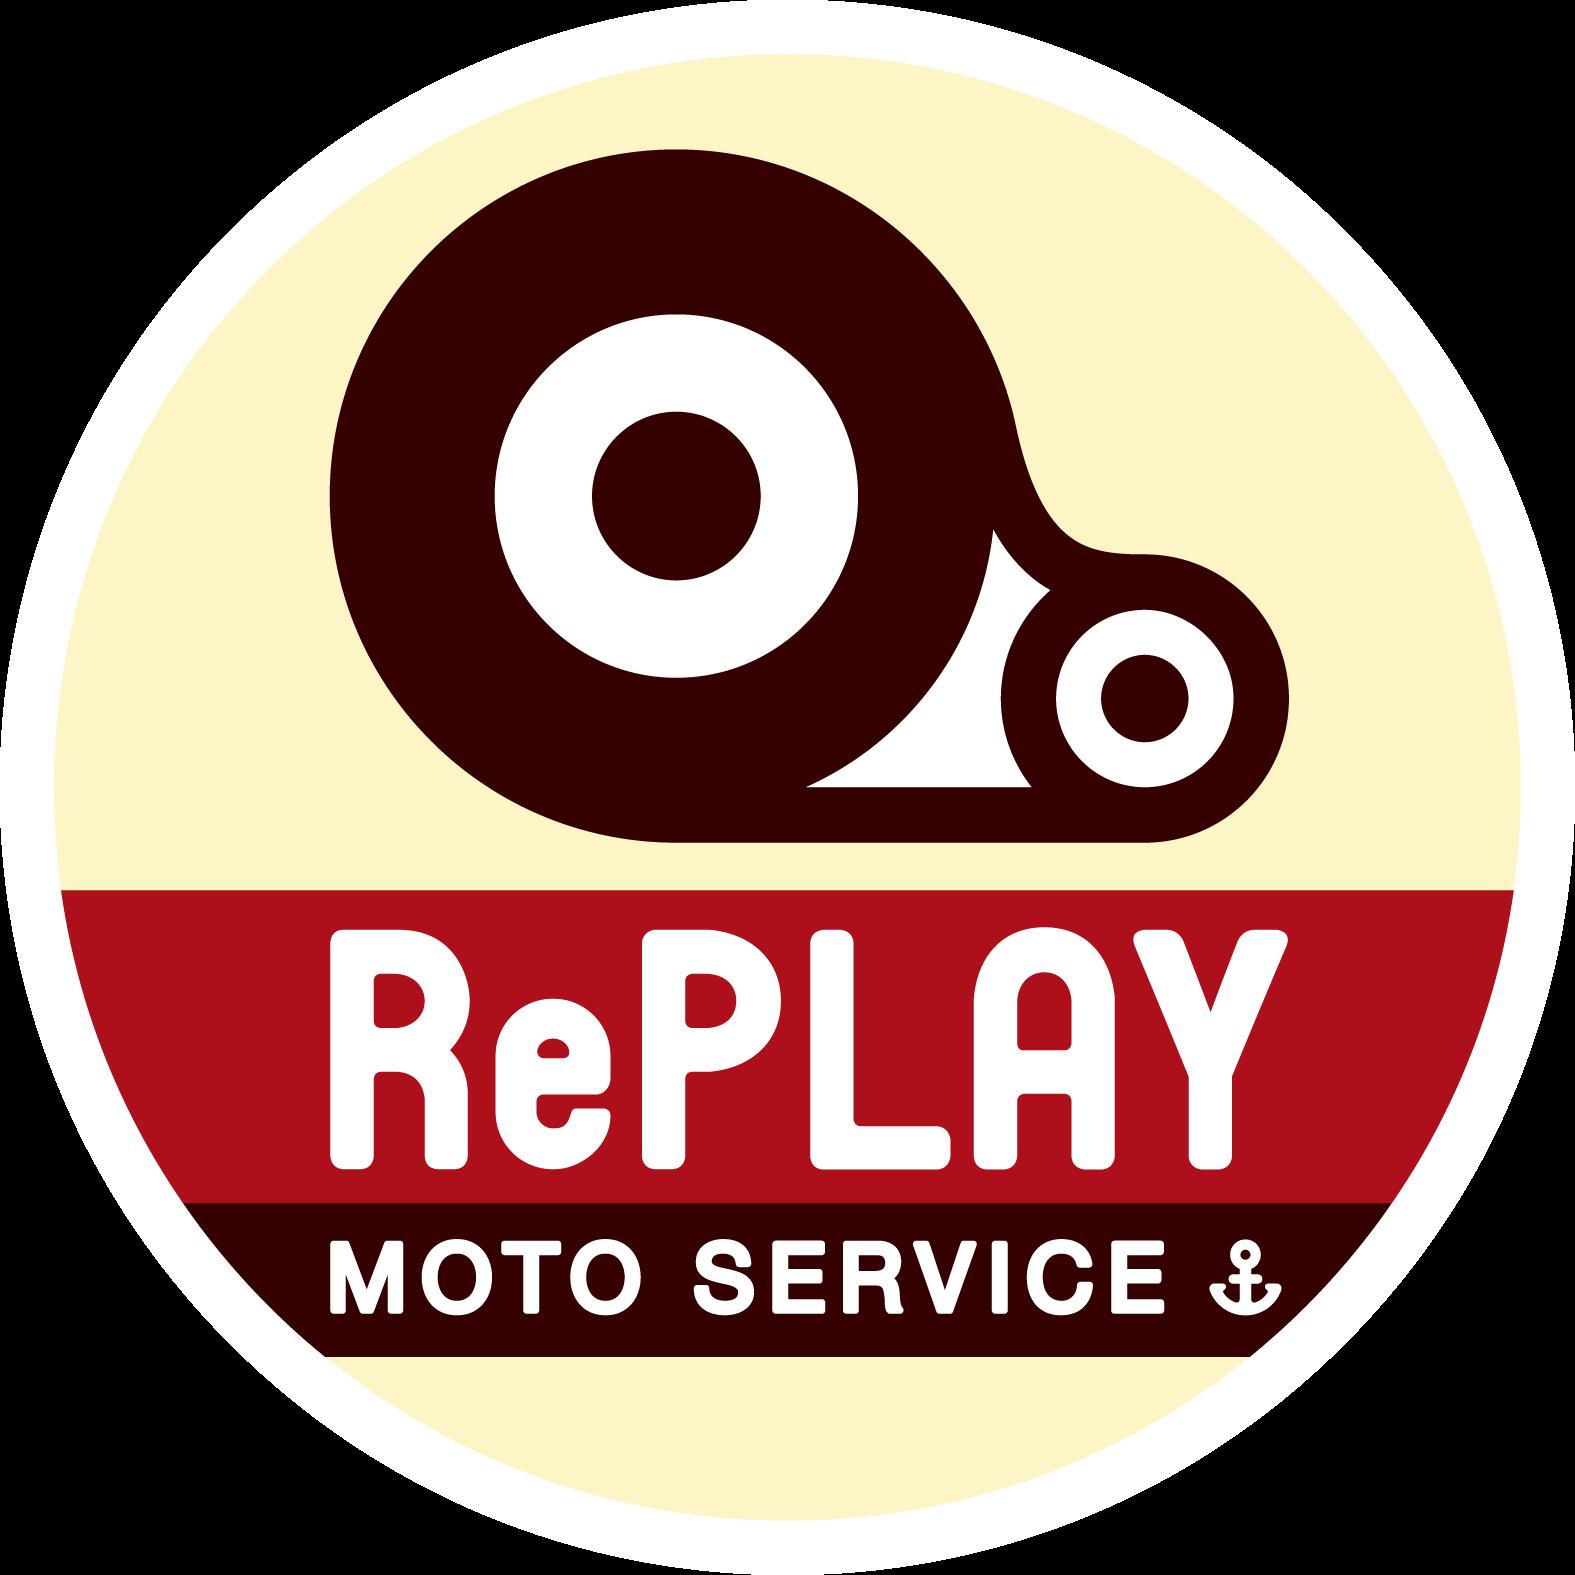 RePLAY Moto Service